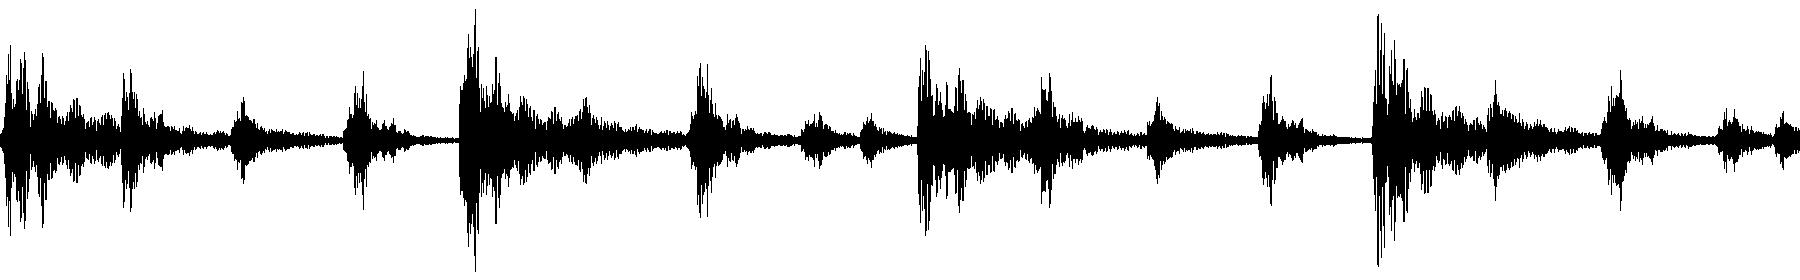 arab percussion loop 6